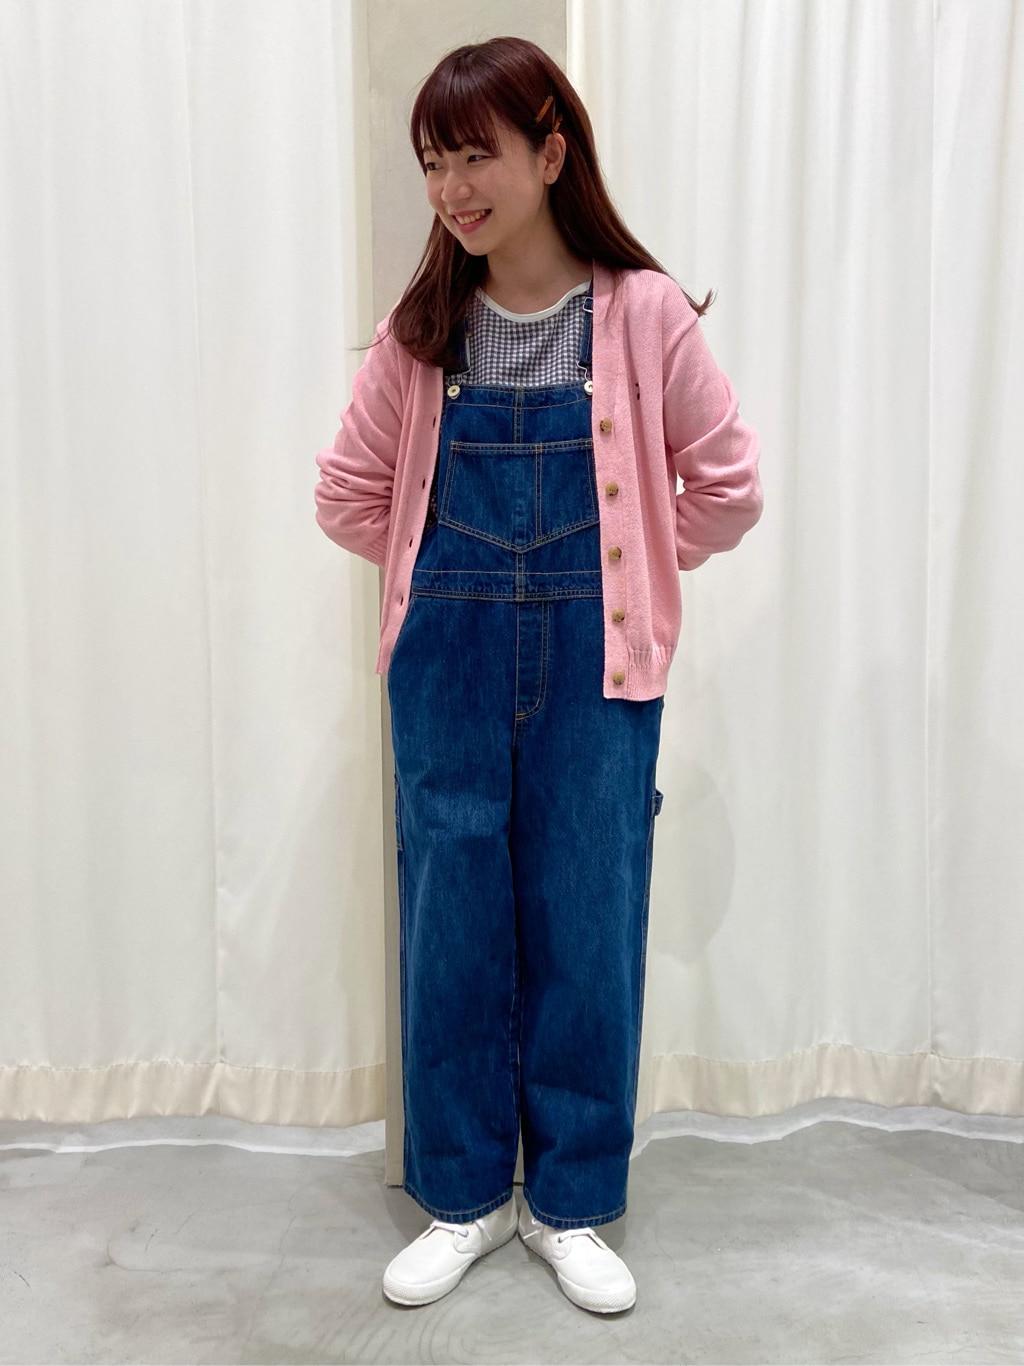 - CHILD WOMAN CHILD WOMAN , PAR ICI 東京スカイツリータウン・ソラマチ 身長:165cm 2021.01.29